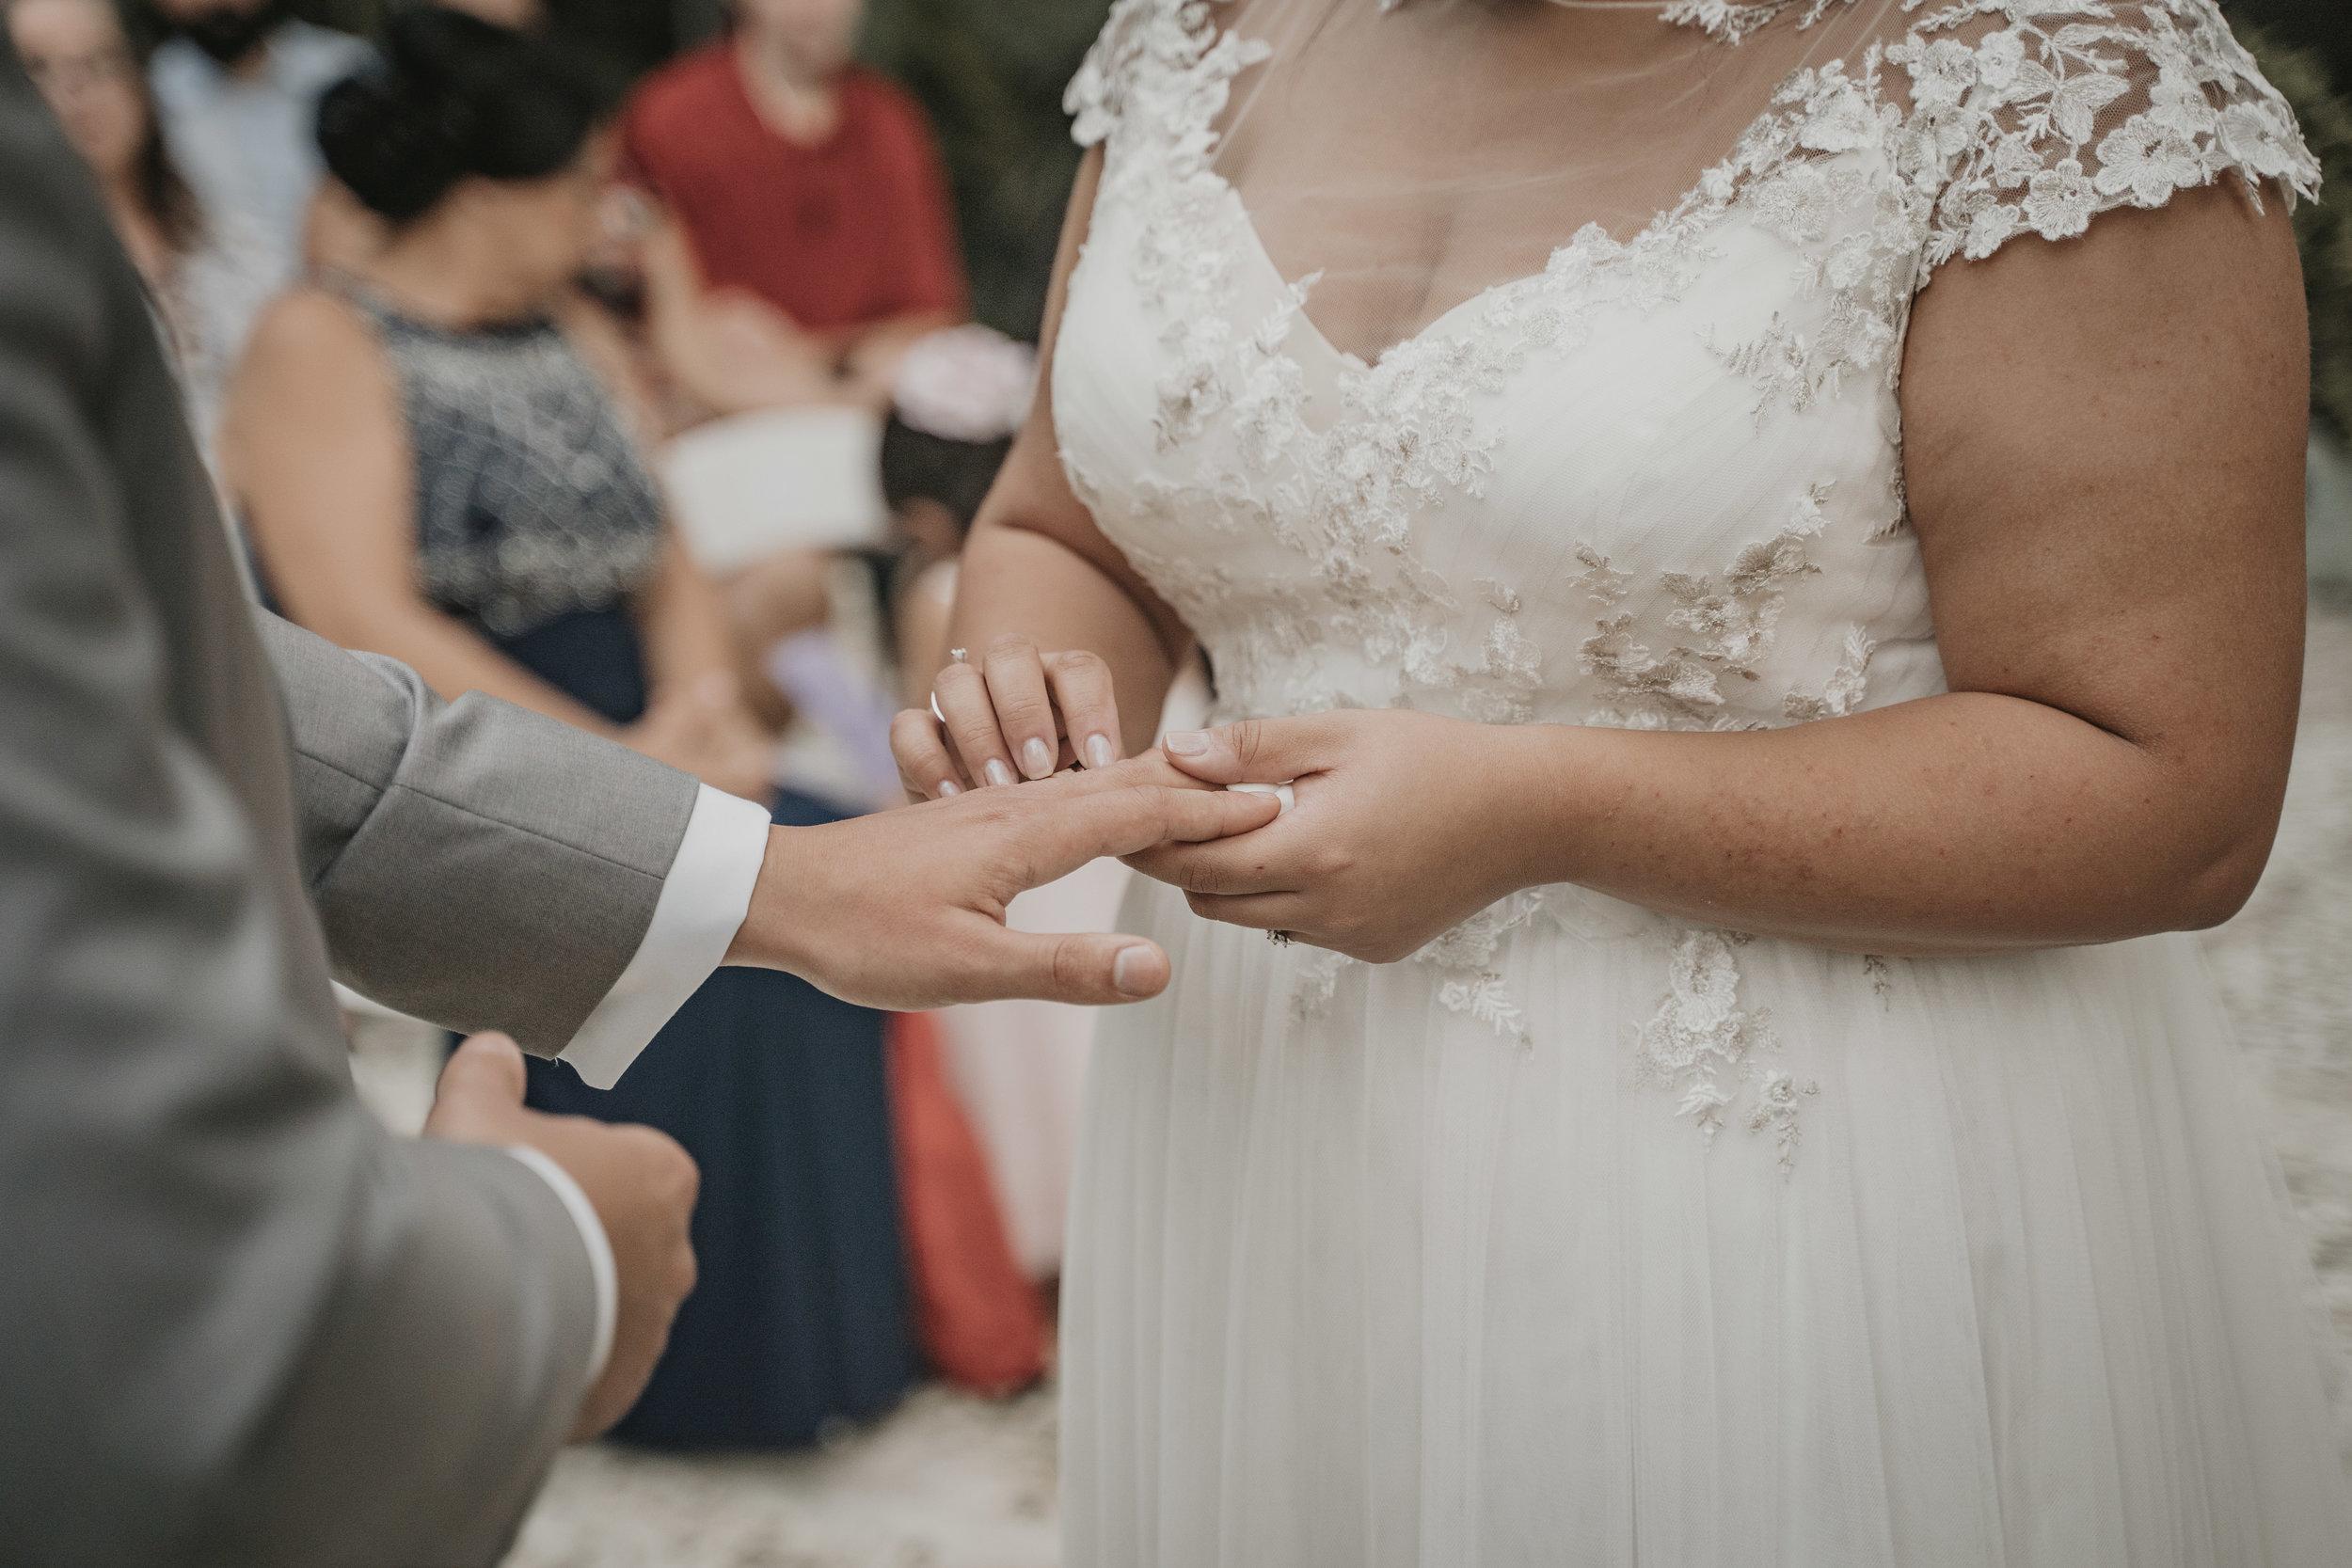 288MICHI&GABEWEDDINGDAY(WeddingFinal).jpg